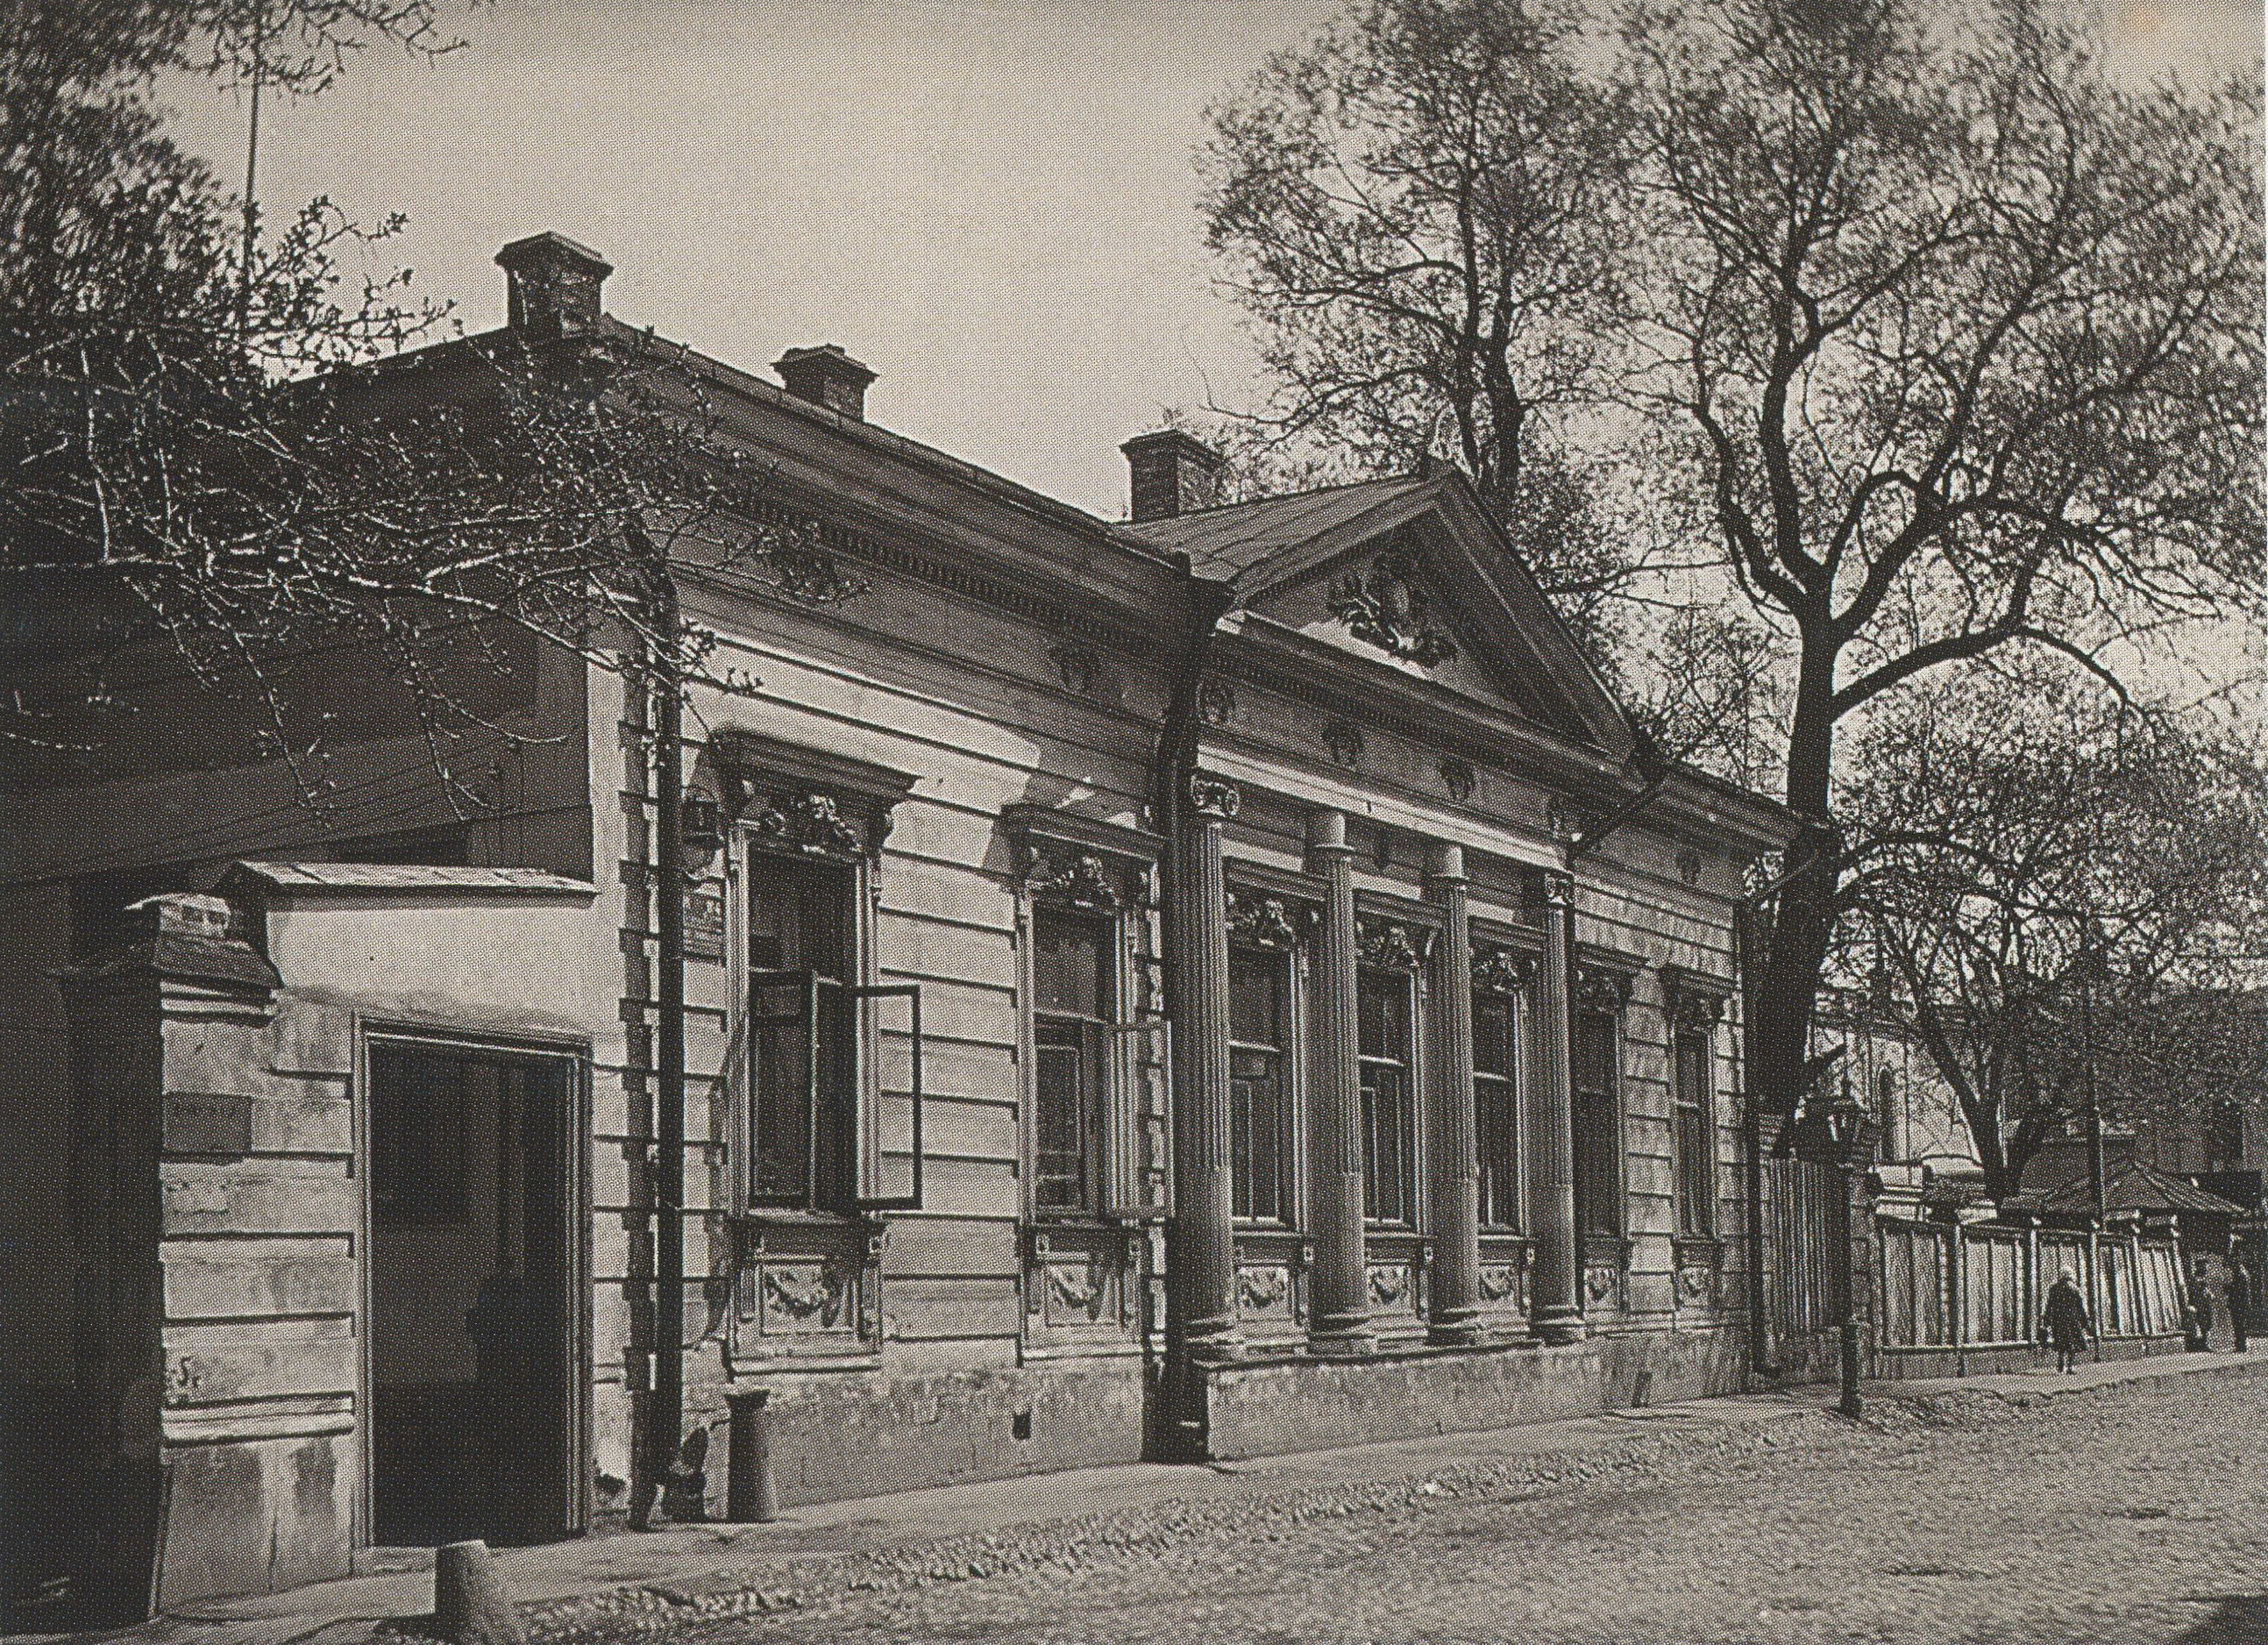 Дом П.А.Кропоткина в Малом Левшинском пер. №4